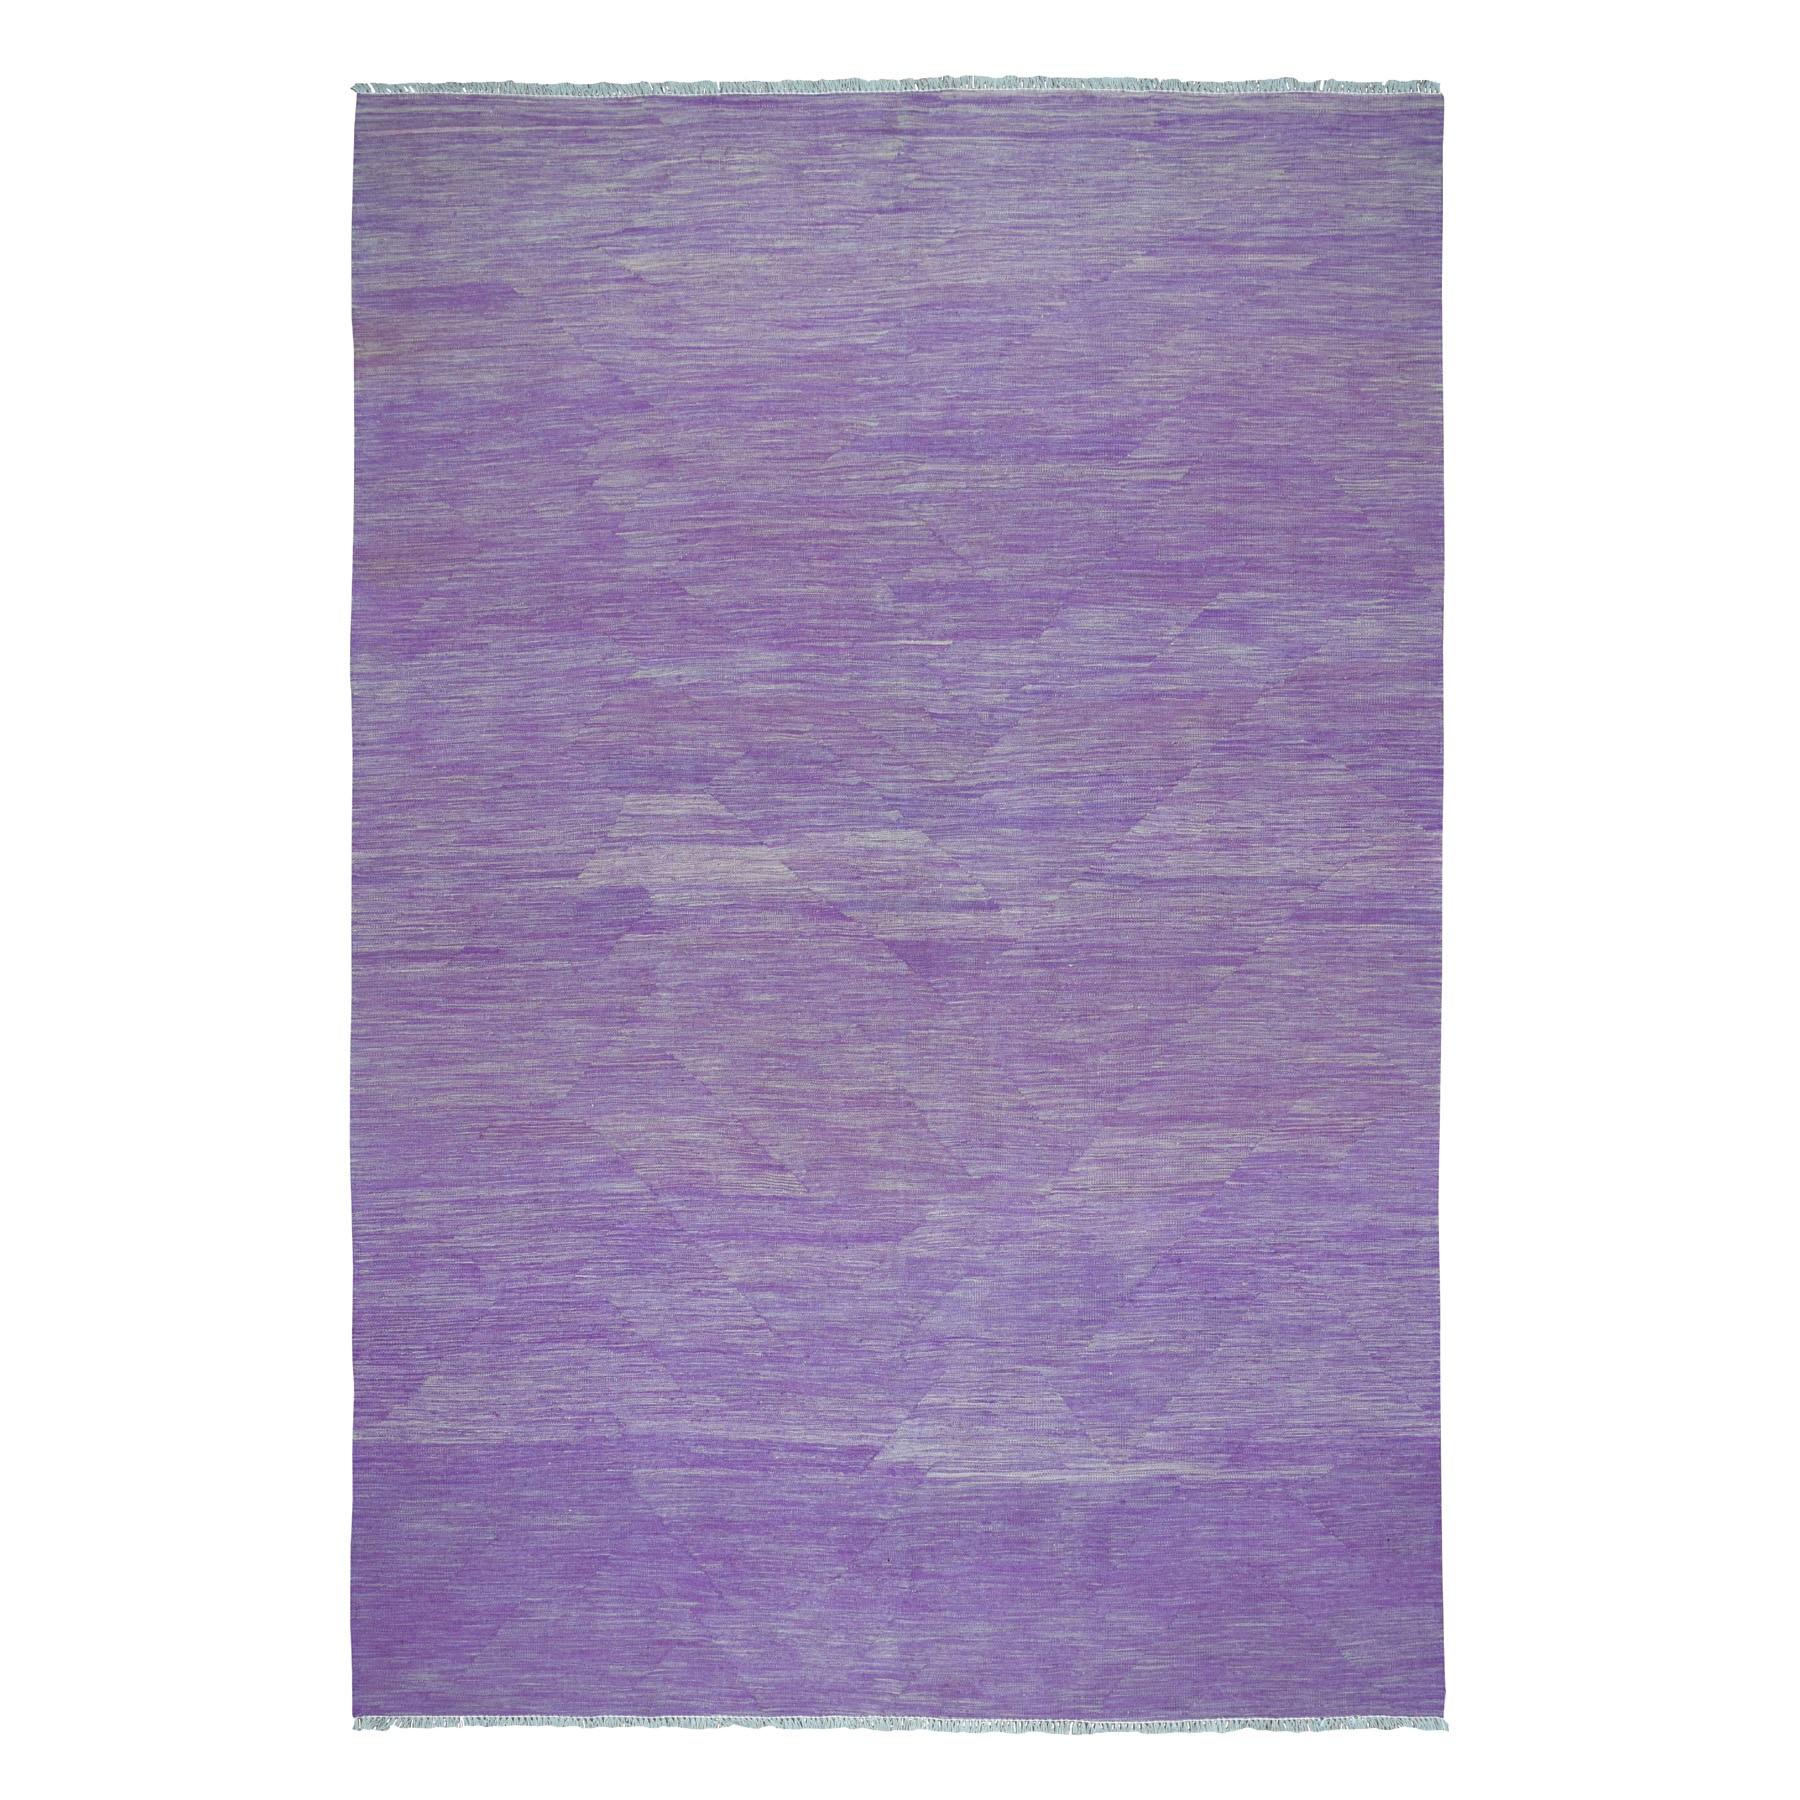 Fine Kilim Collection Hand Woven Purple Rug No: 1108426